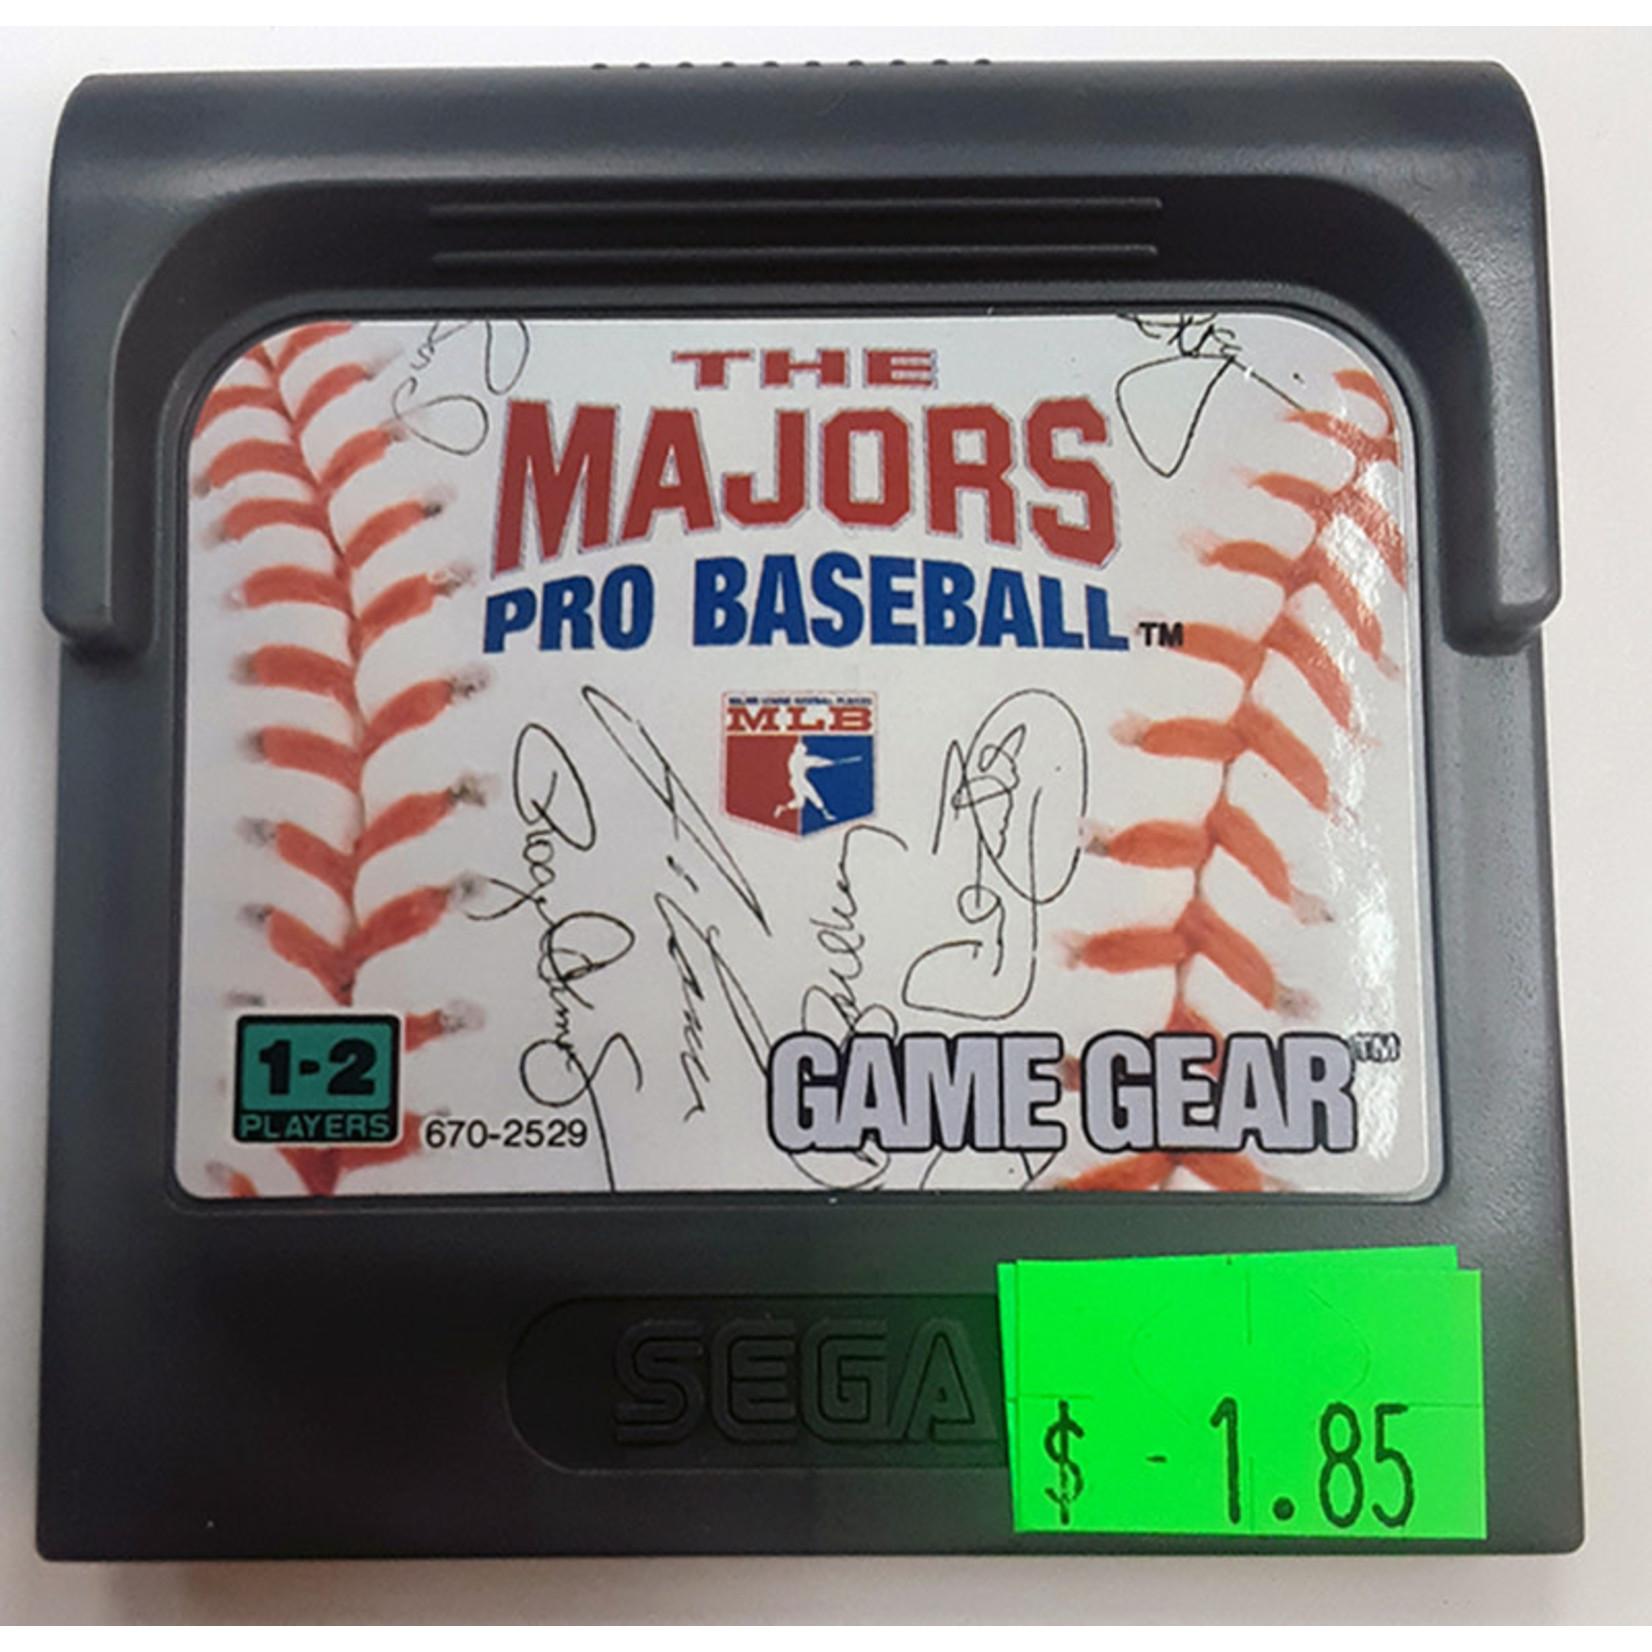 GGu-The Majors Pro Baseball